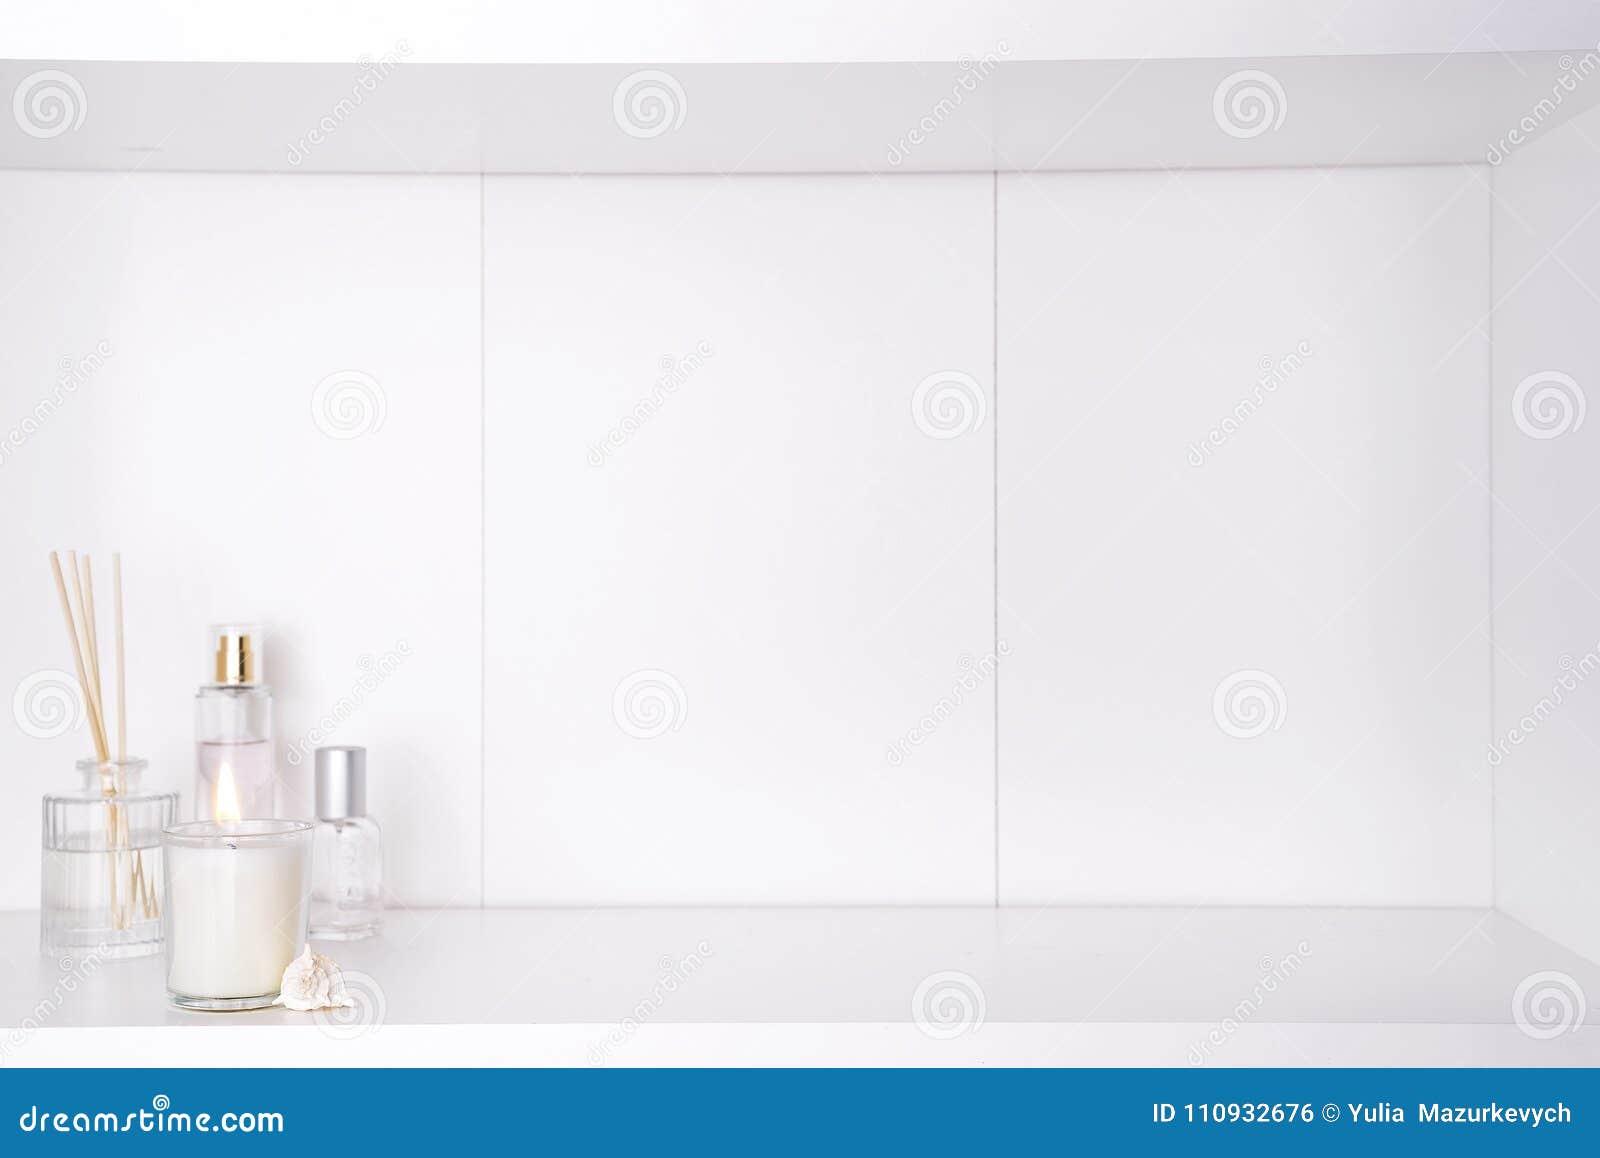 Палочки свечи и ароматности в ванной комнате